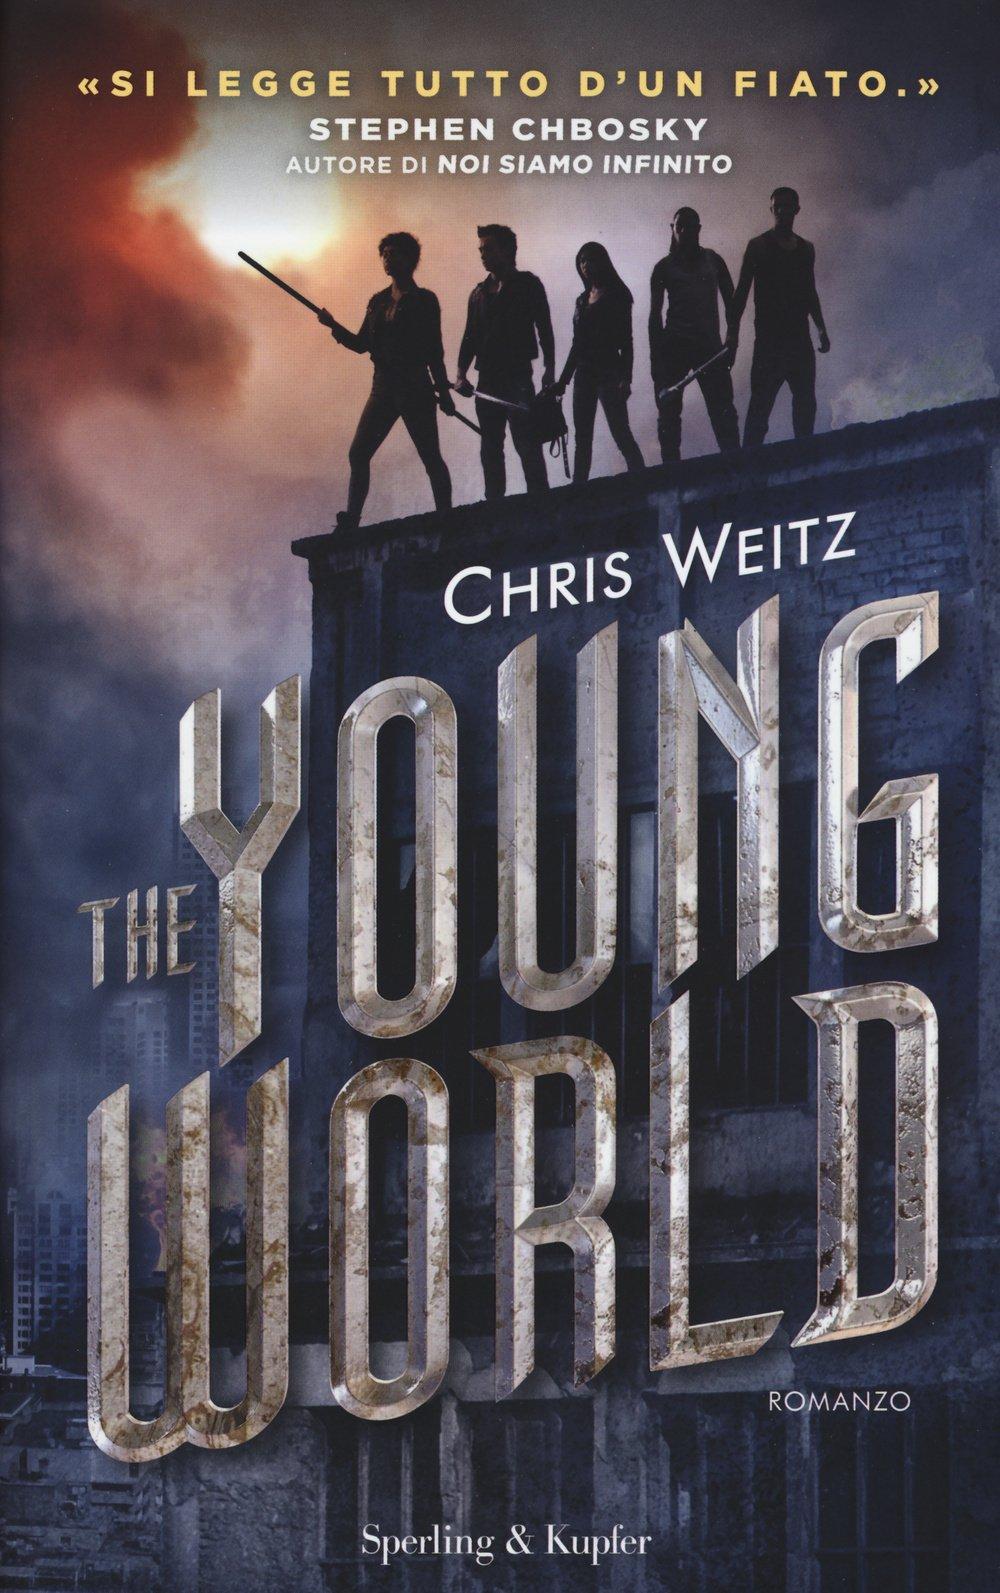 The young world: Amazon.it: Weitz, Chris, Pastorino, G.: Libri